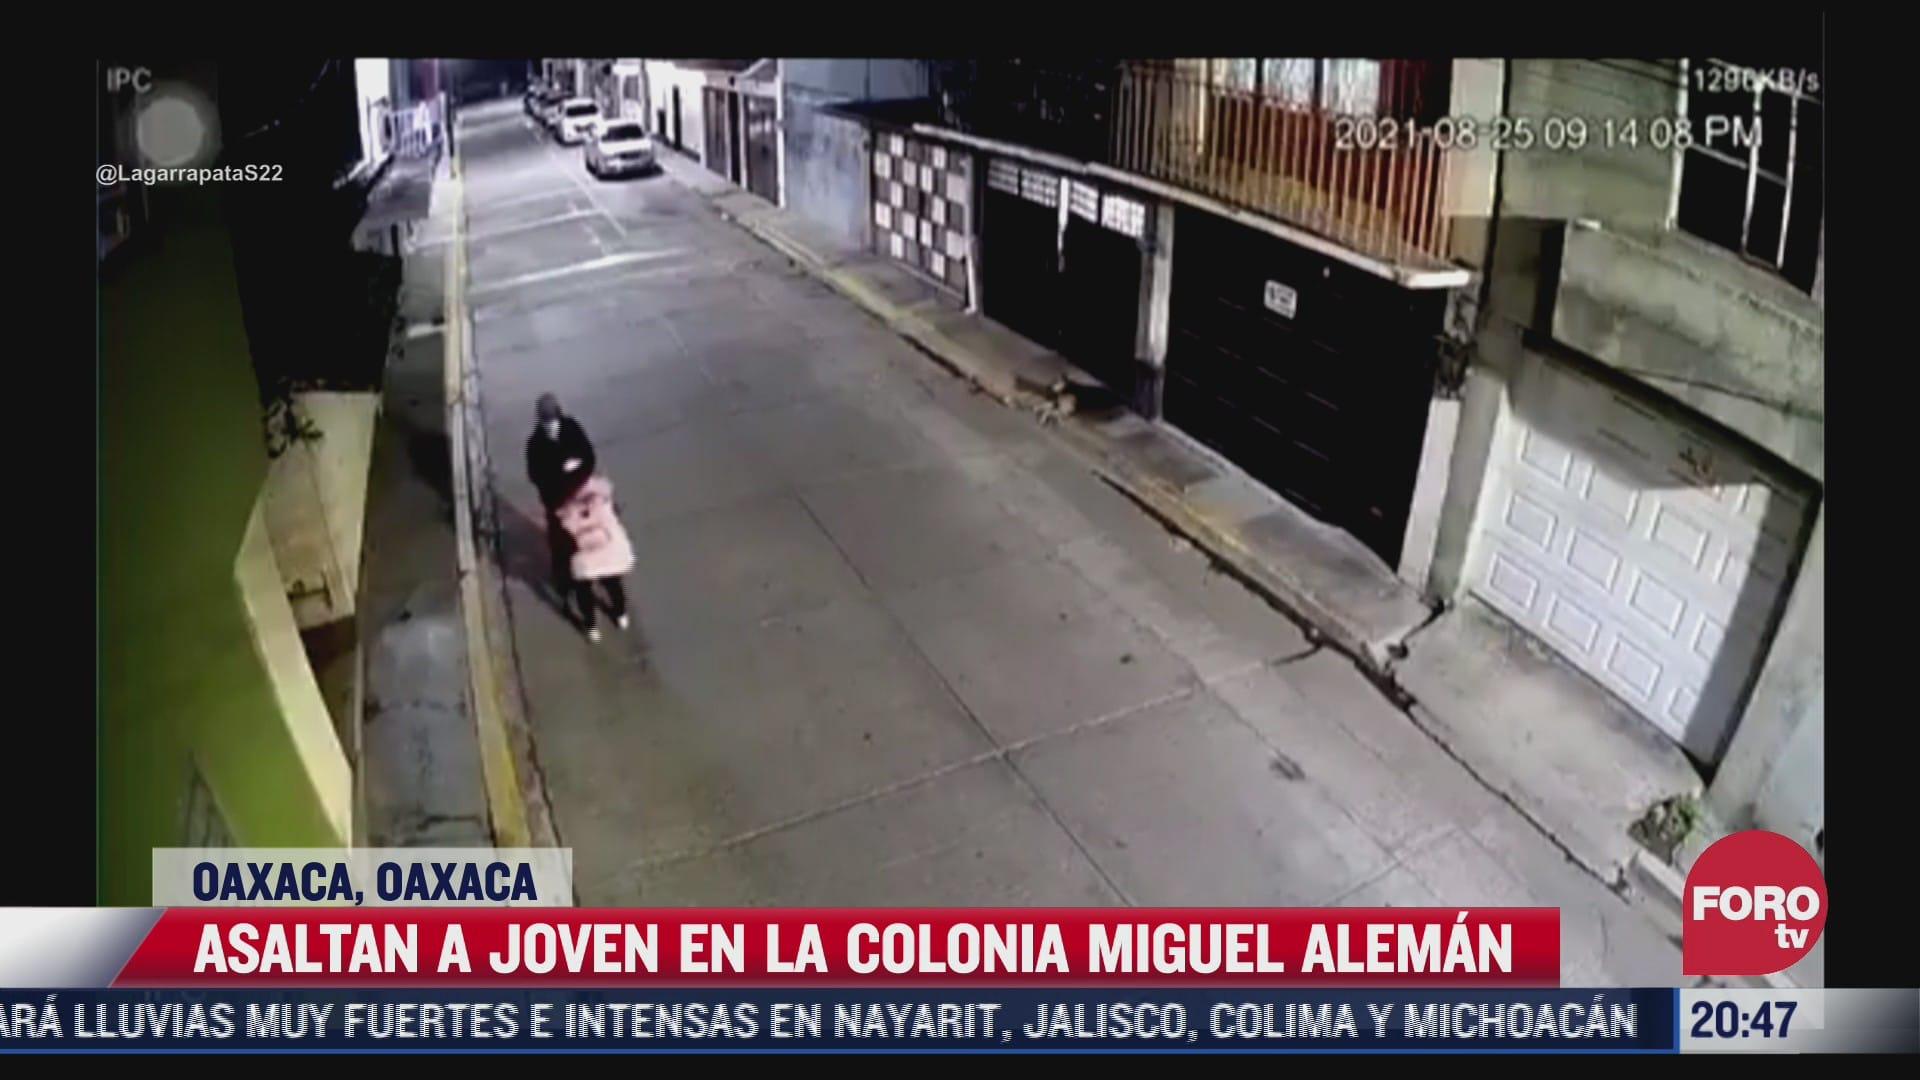 captan el asalto a una joven en oaxaca